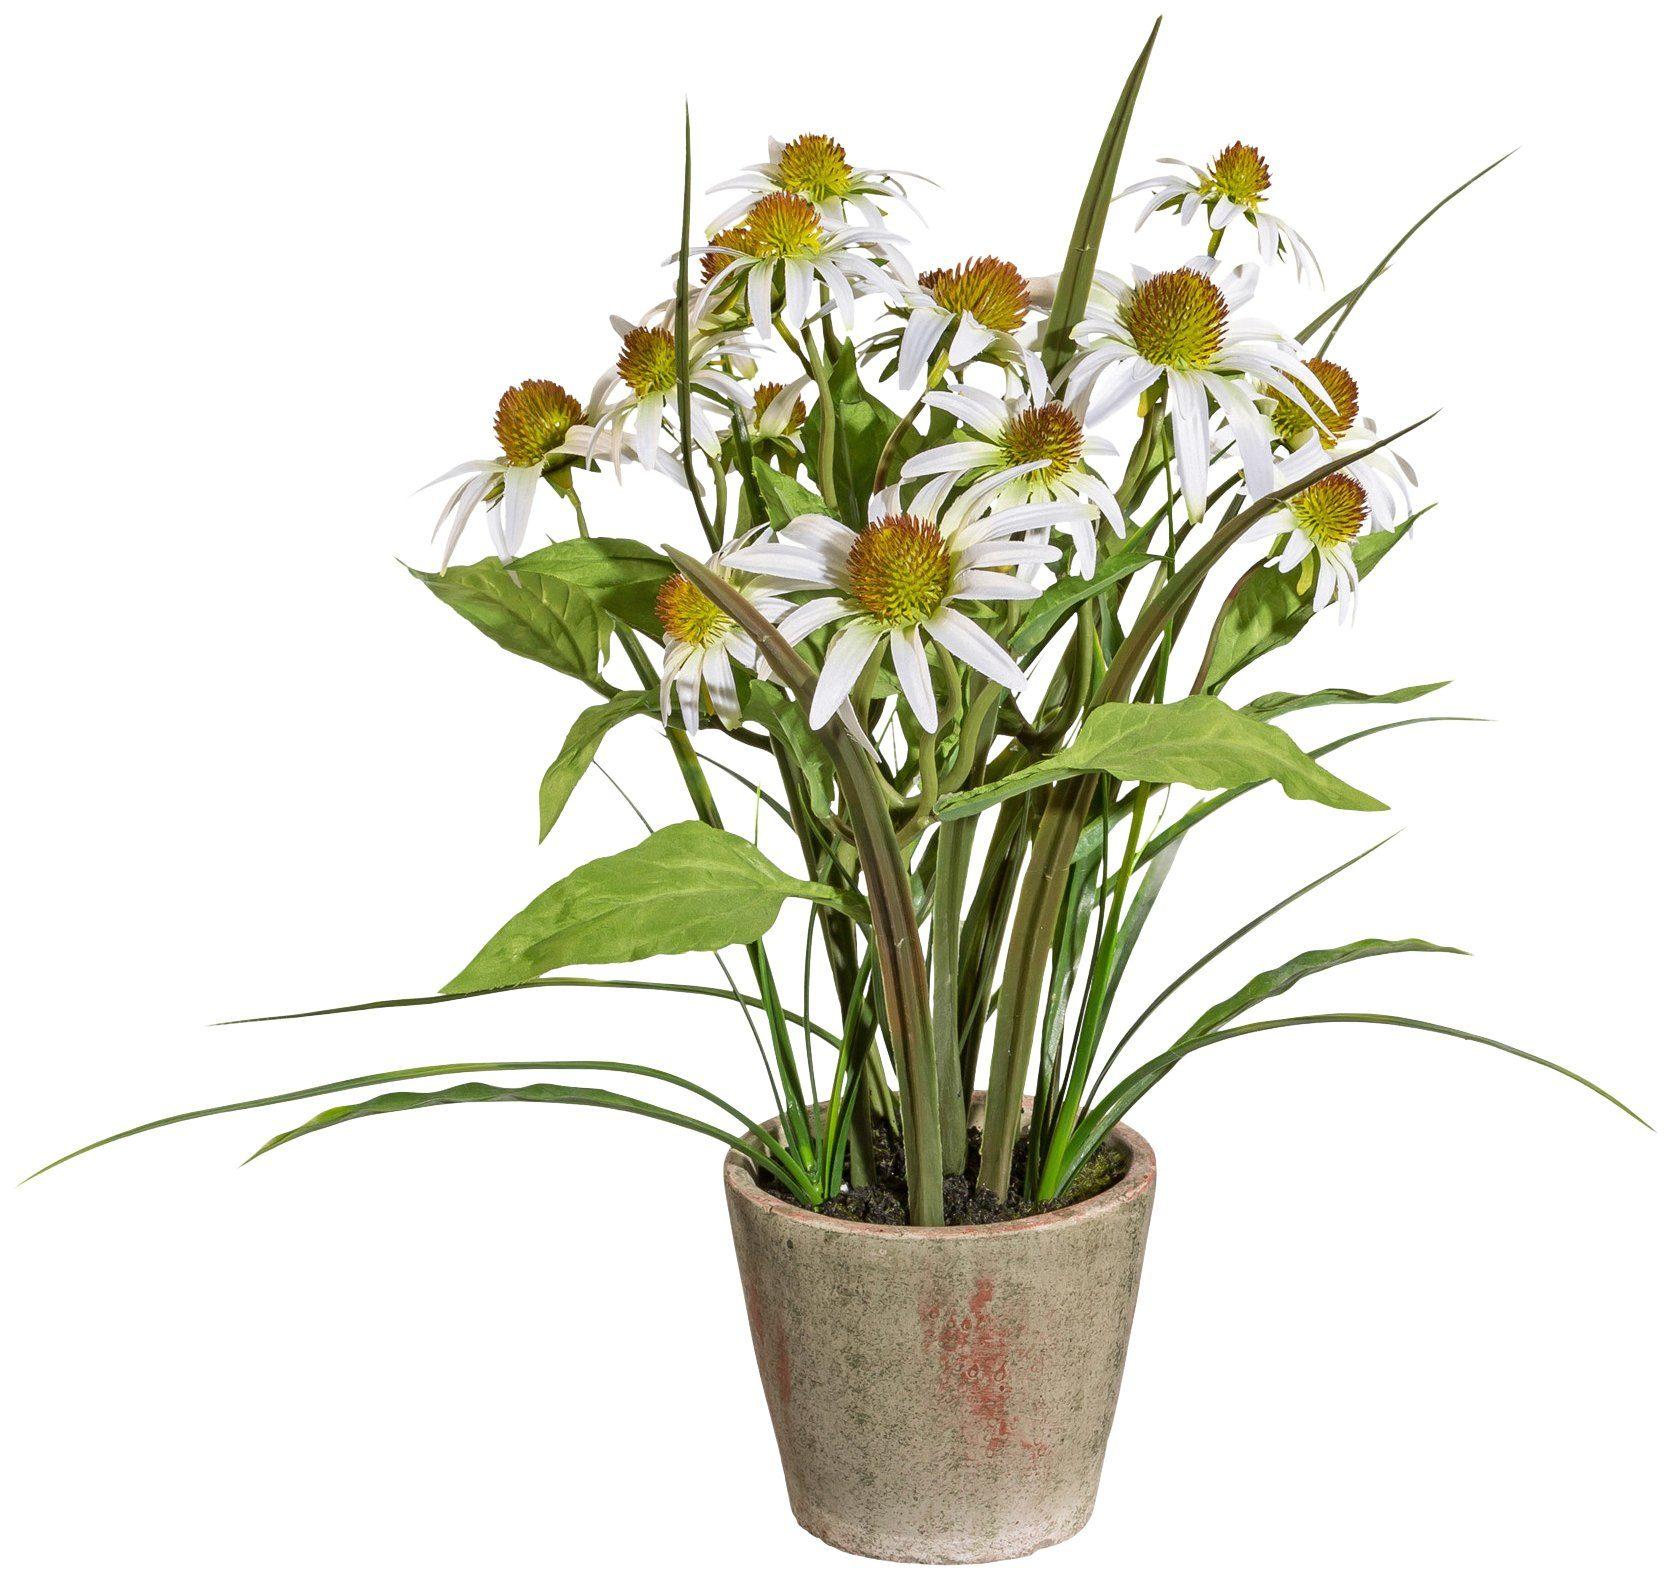 Kunstpflanze »Rudbeckia«, im Zementtopf, Höhe 40 cm, weiß